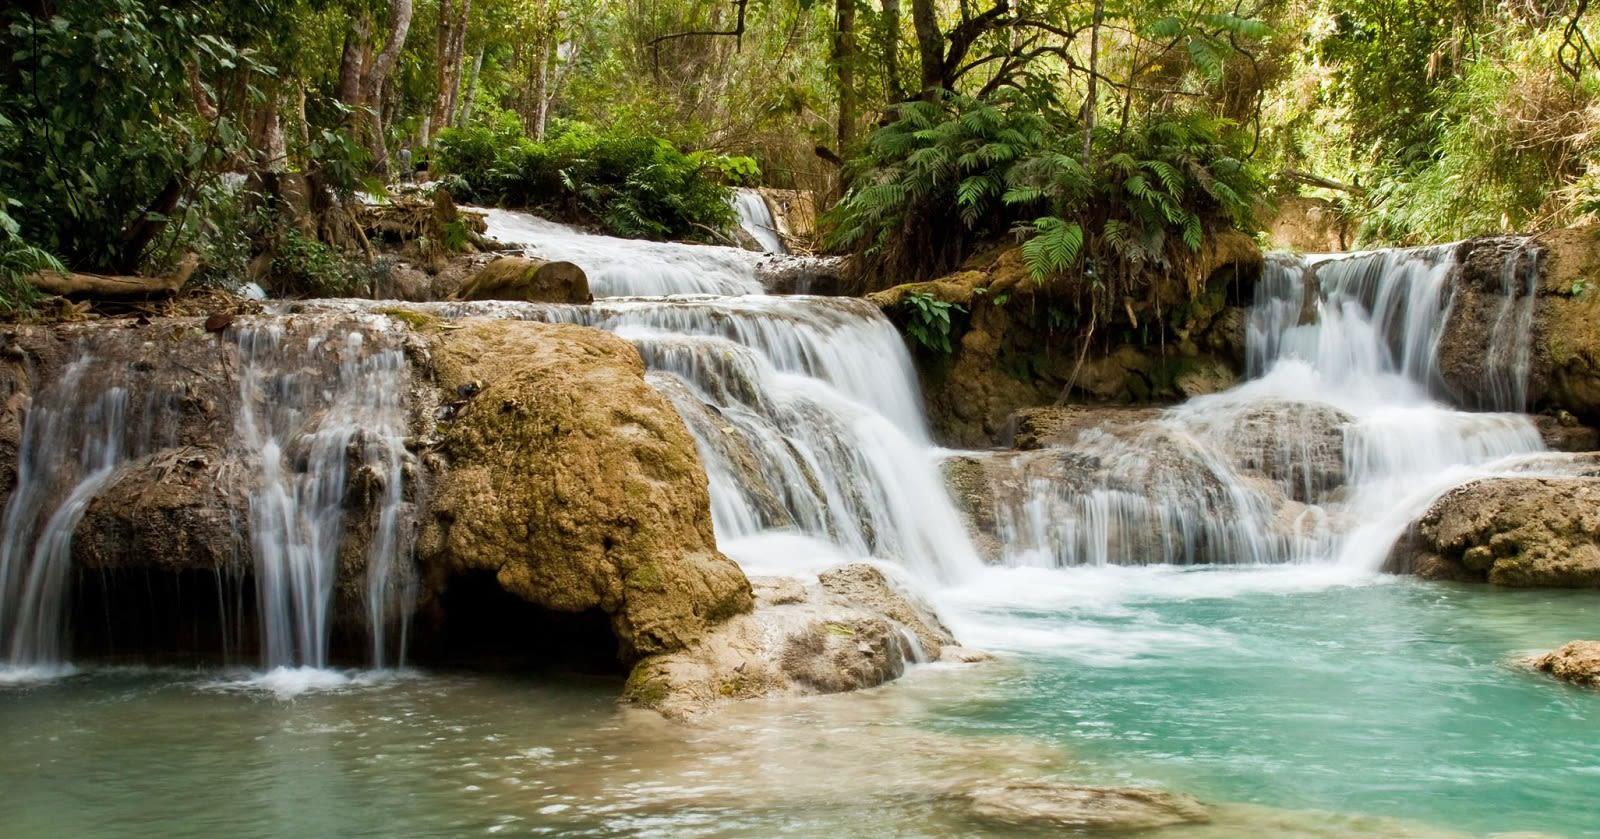 Laos travel guide